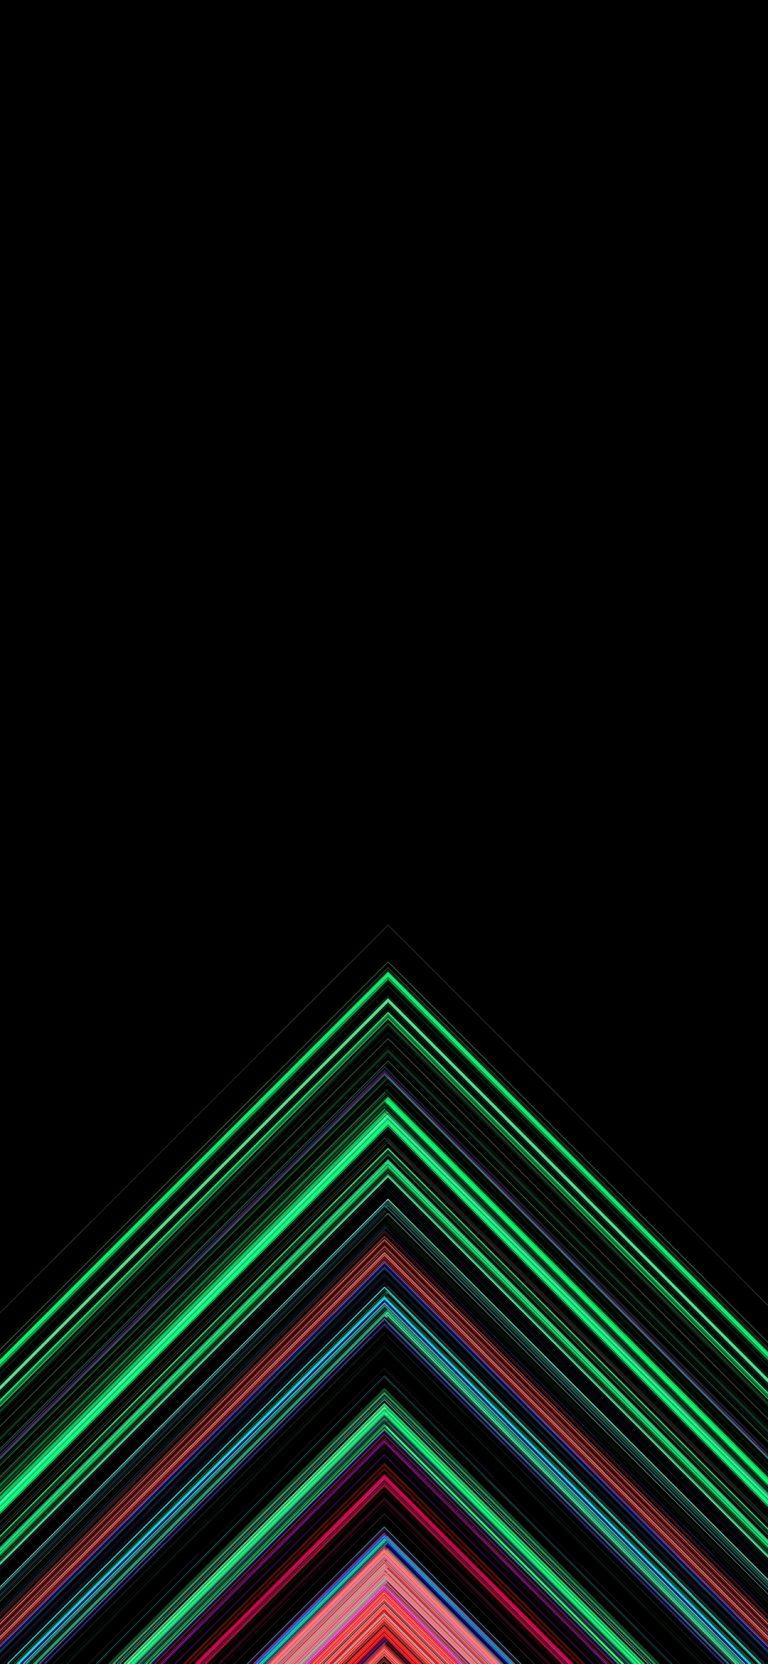 Amoled Phone Wallpaper 001 1080x2340 768x1664